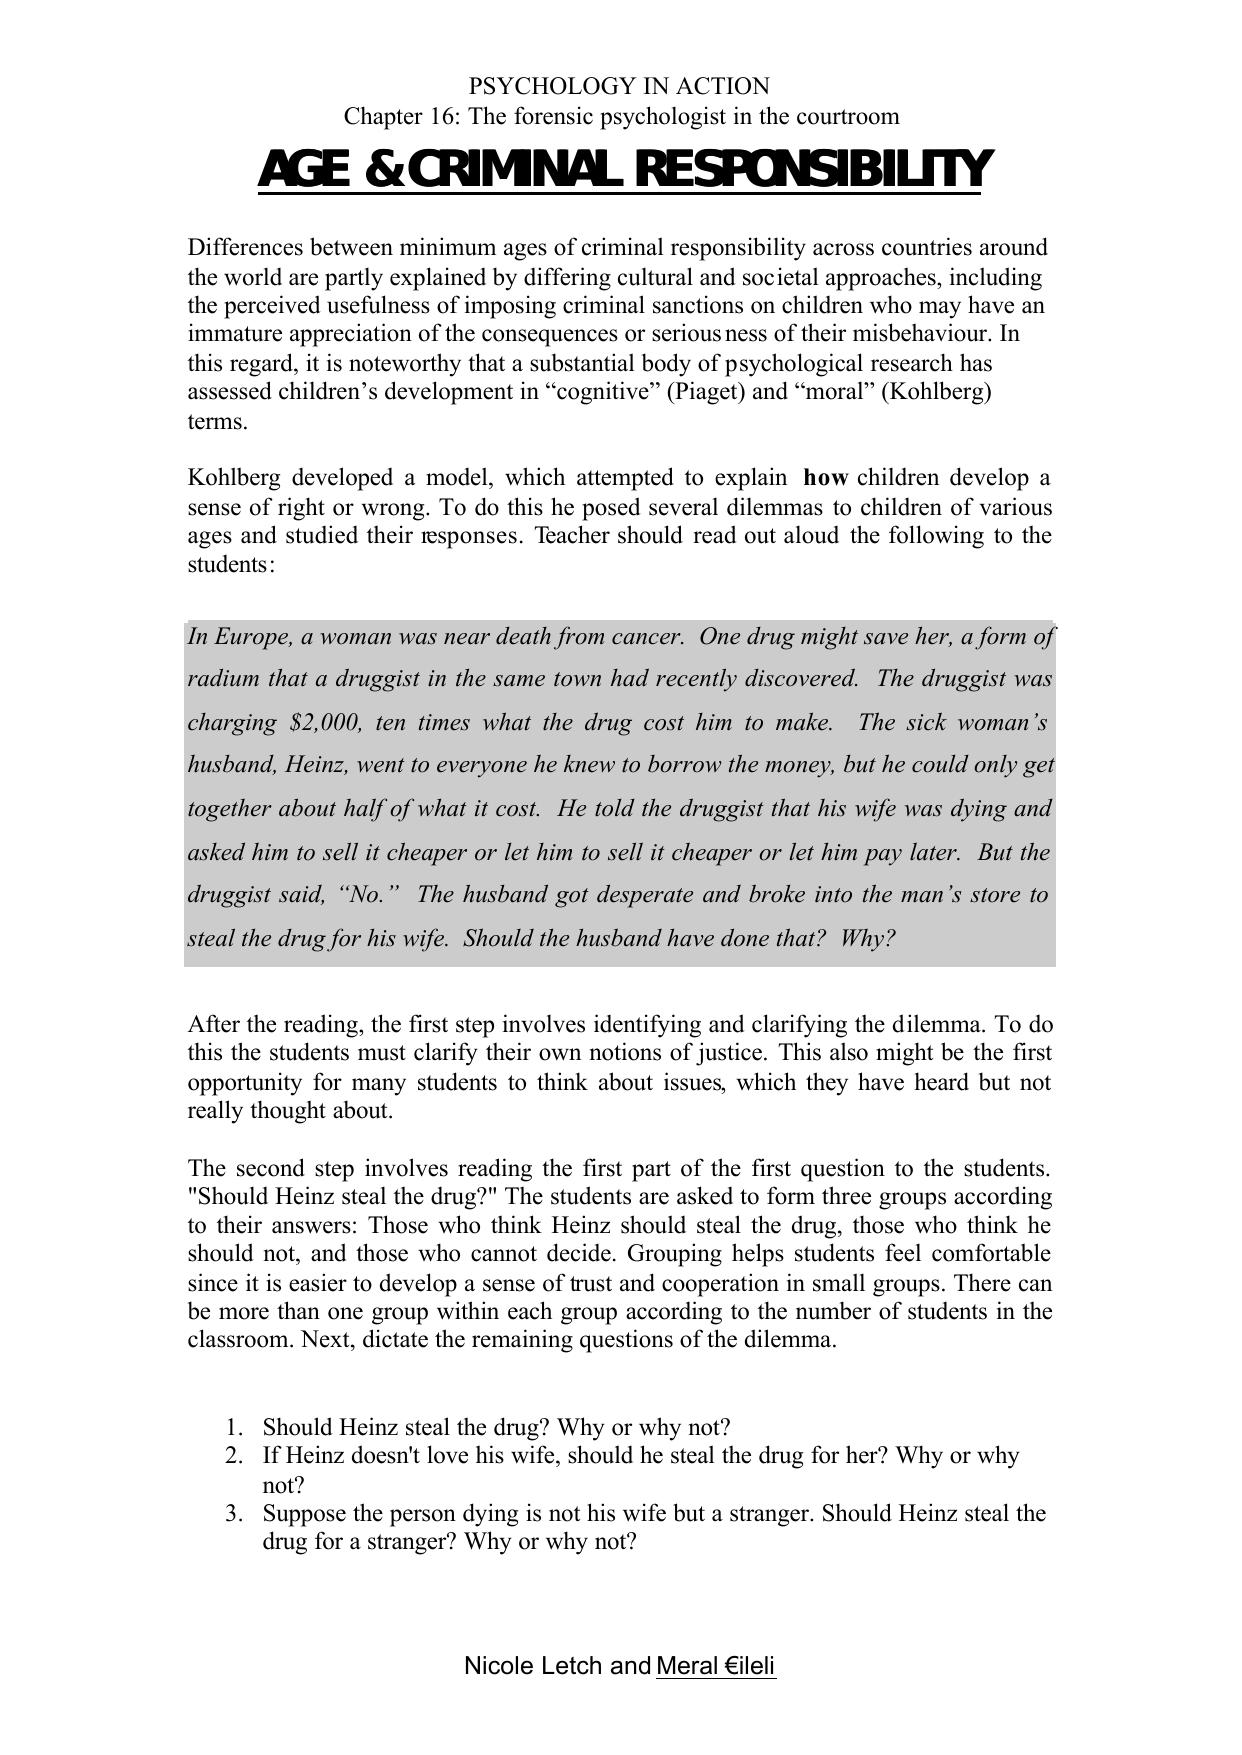 Ethical Filter Worksheet Essay